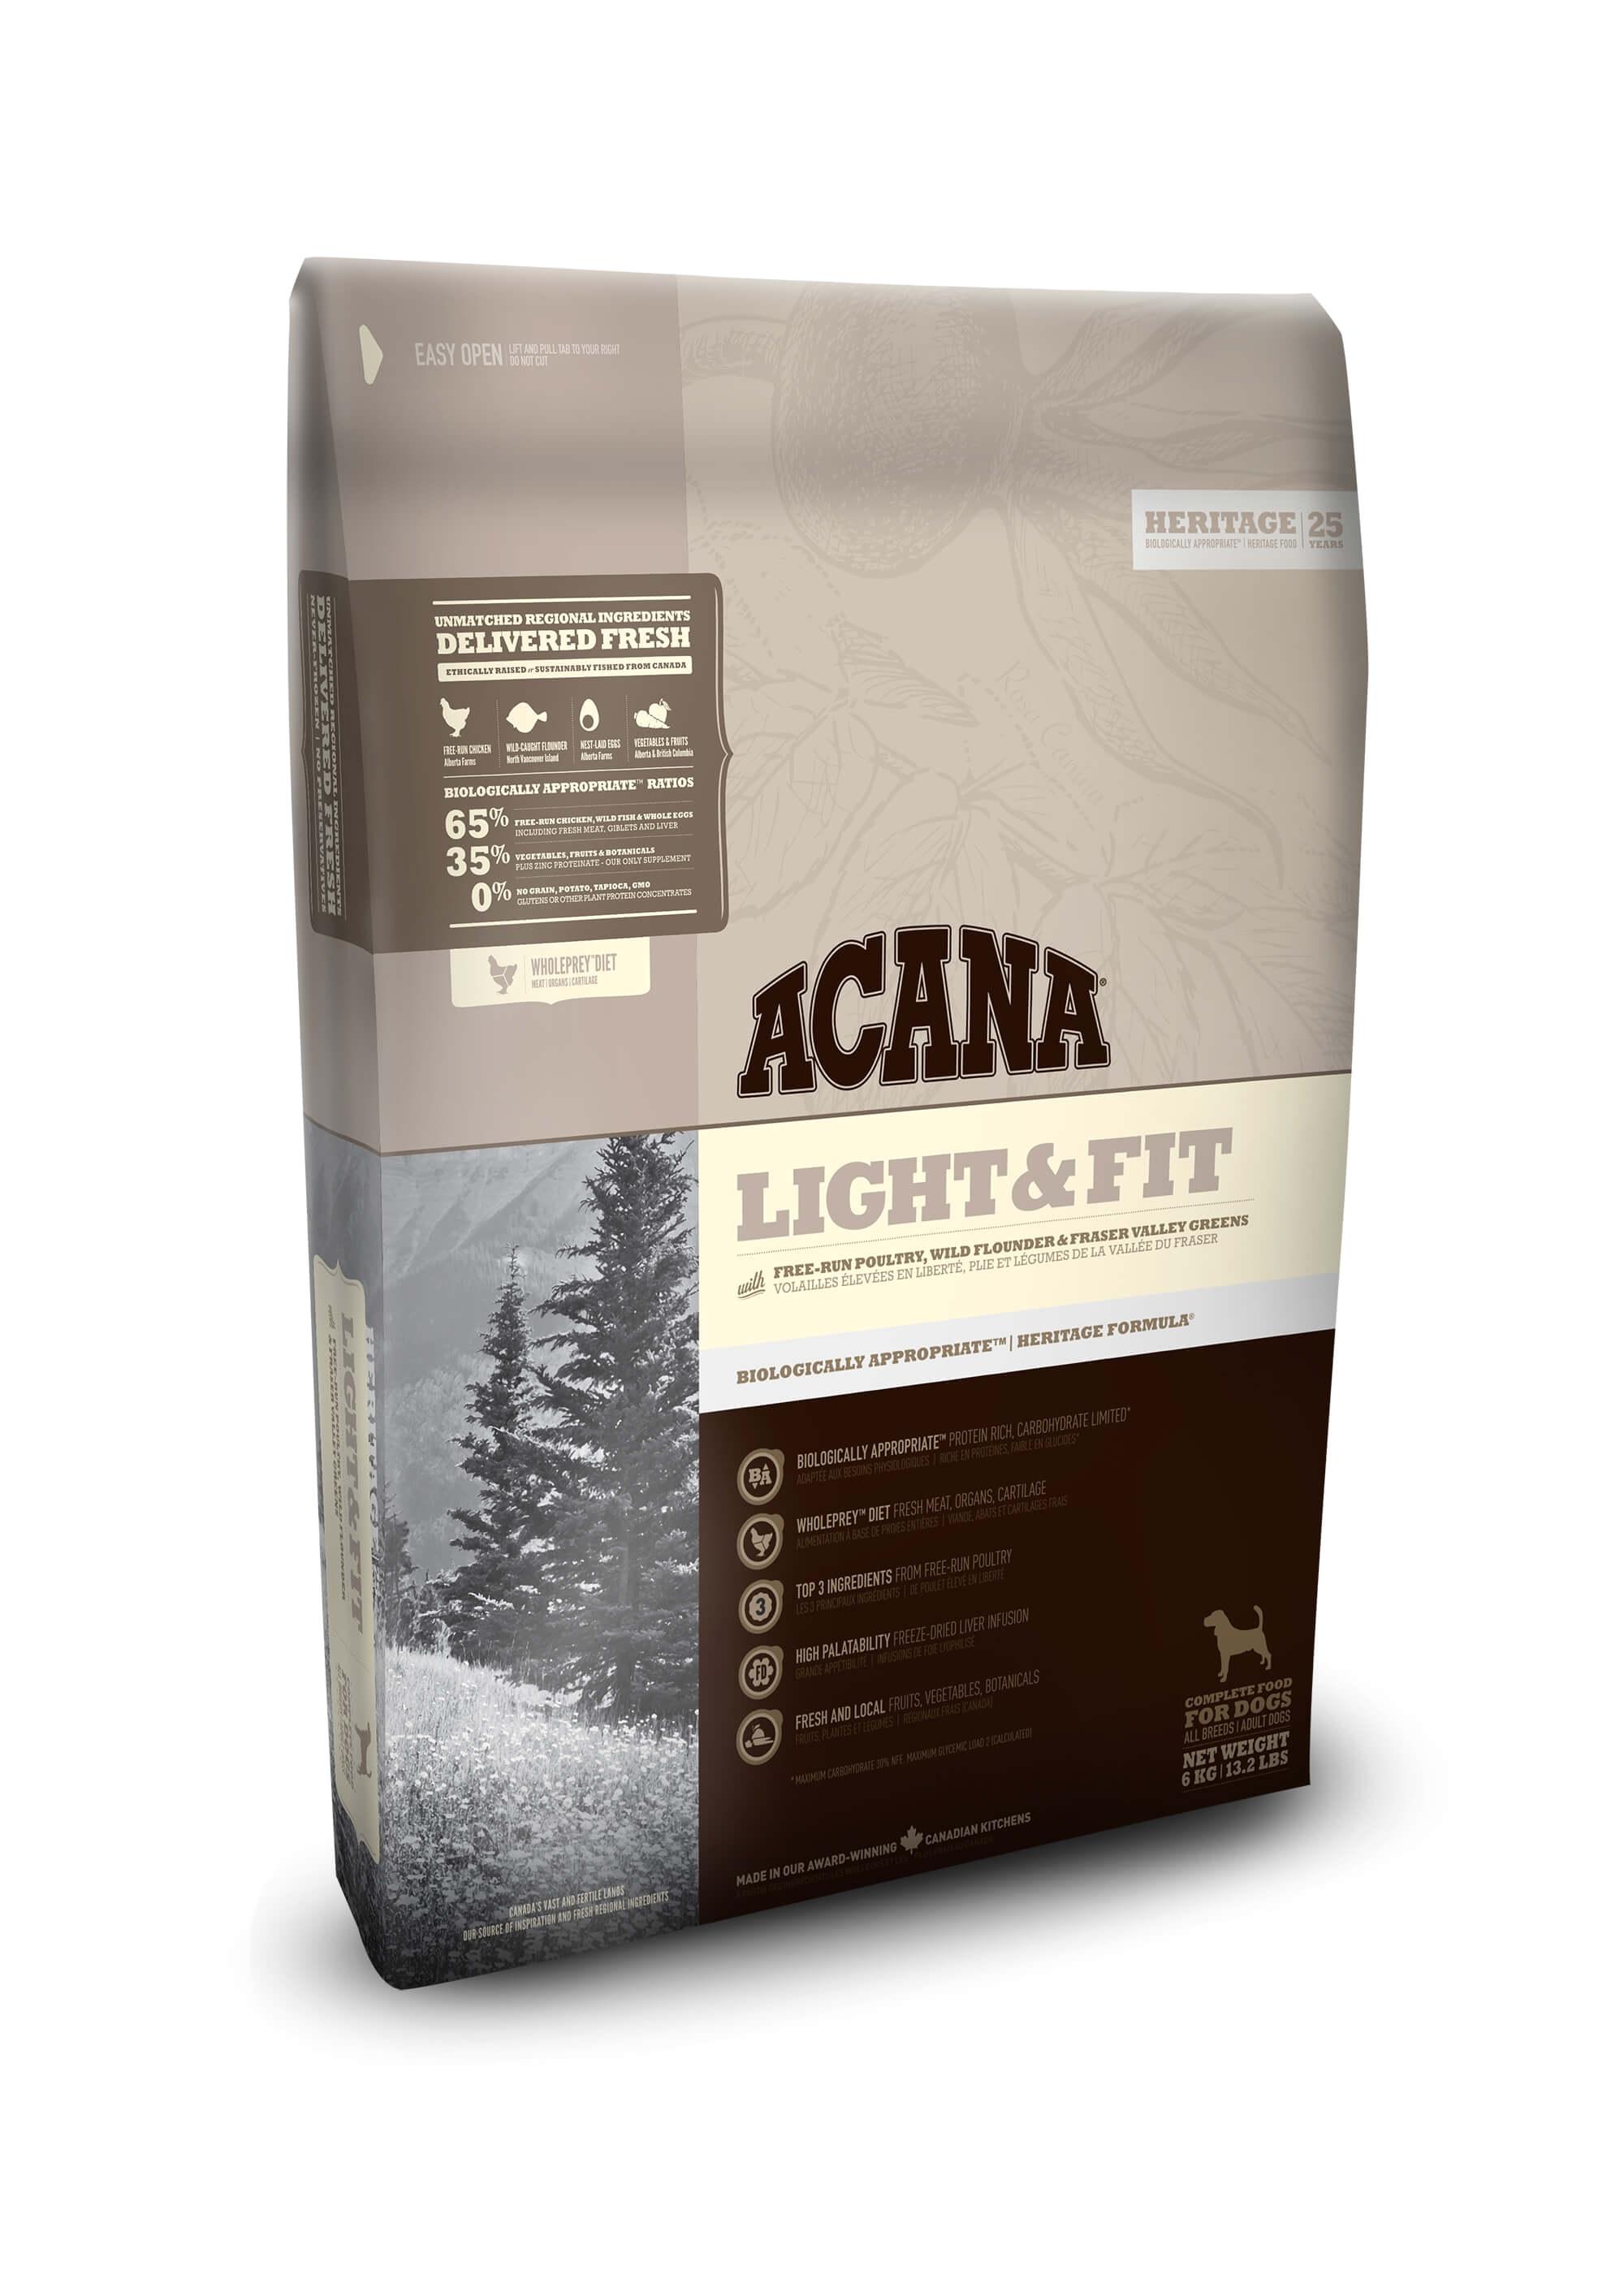 acana light and fit dog food